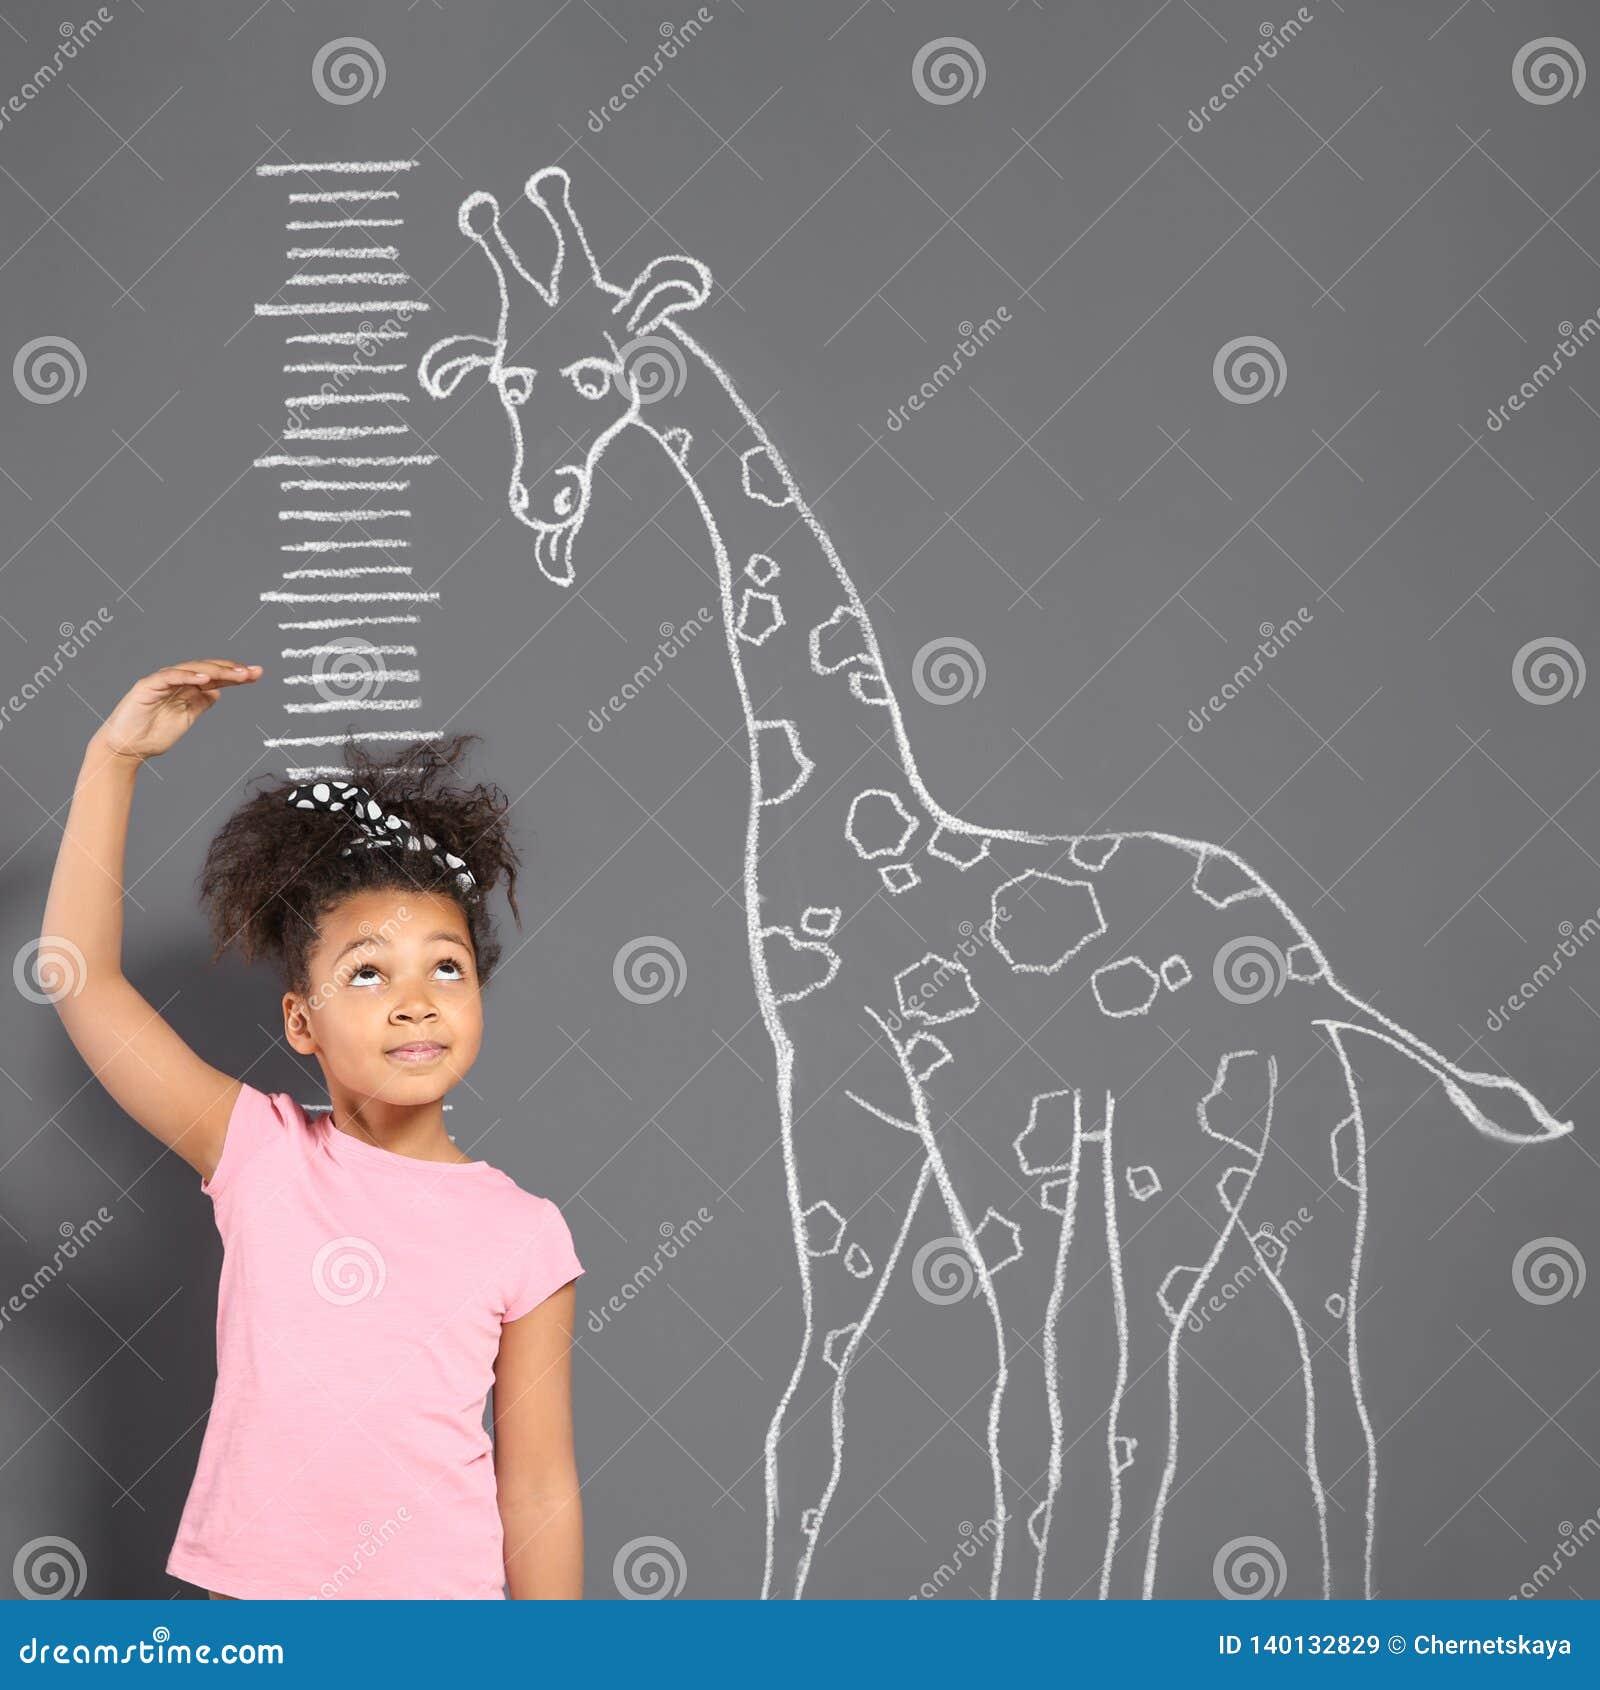 African-American child measuring height near chalk giraffe drawing